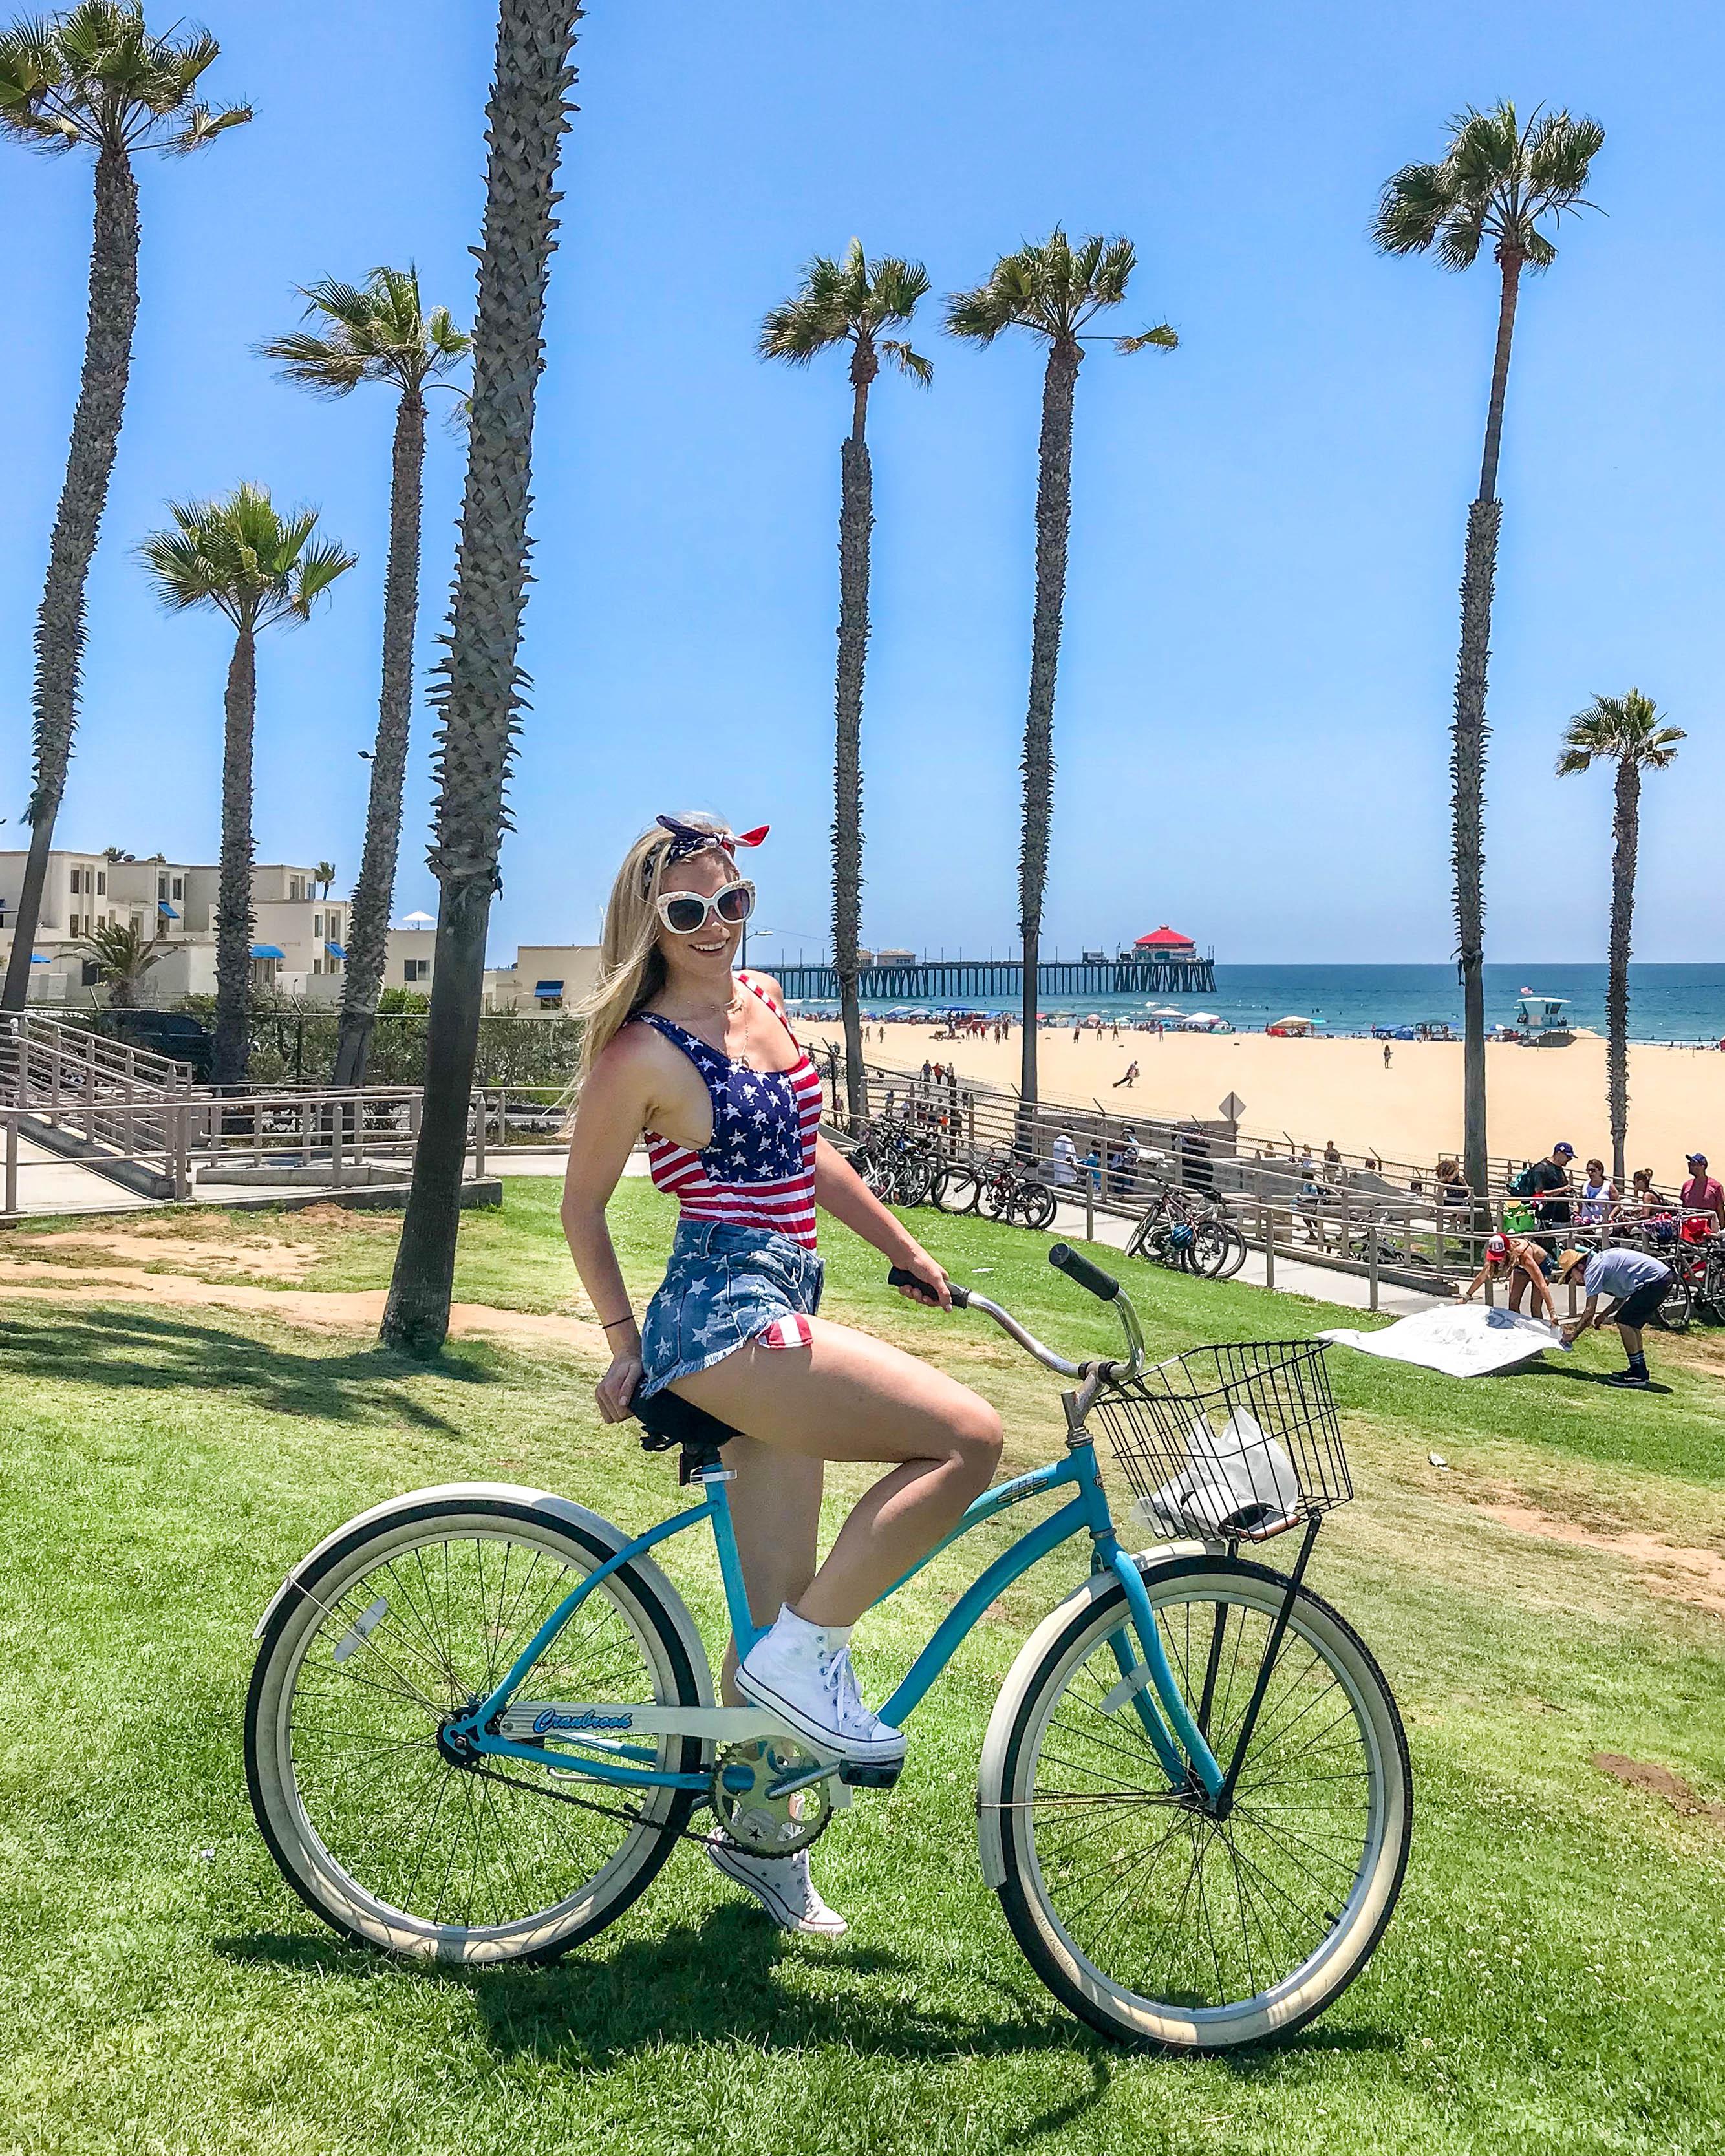 Huntington Beach Pier Surf City USA Travel Guide to Los Angeles California